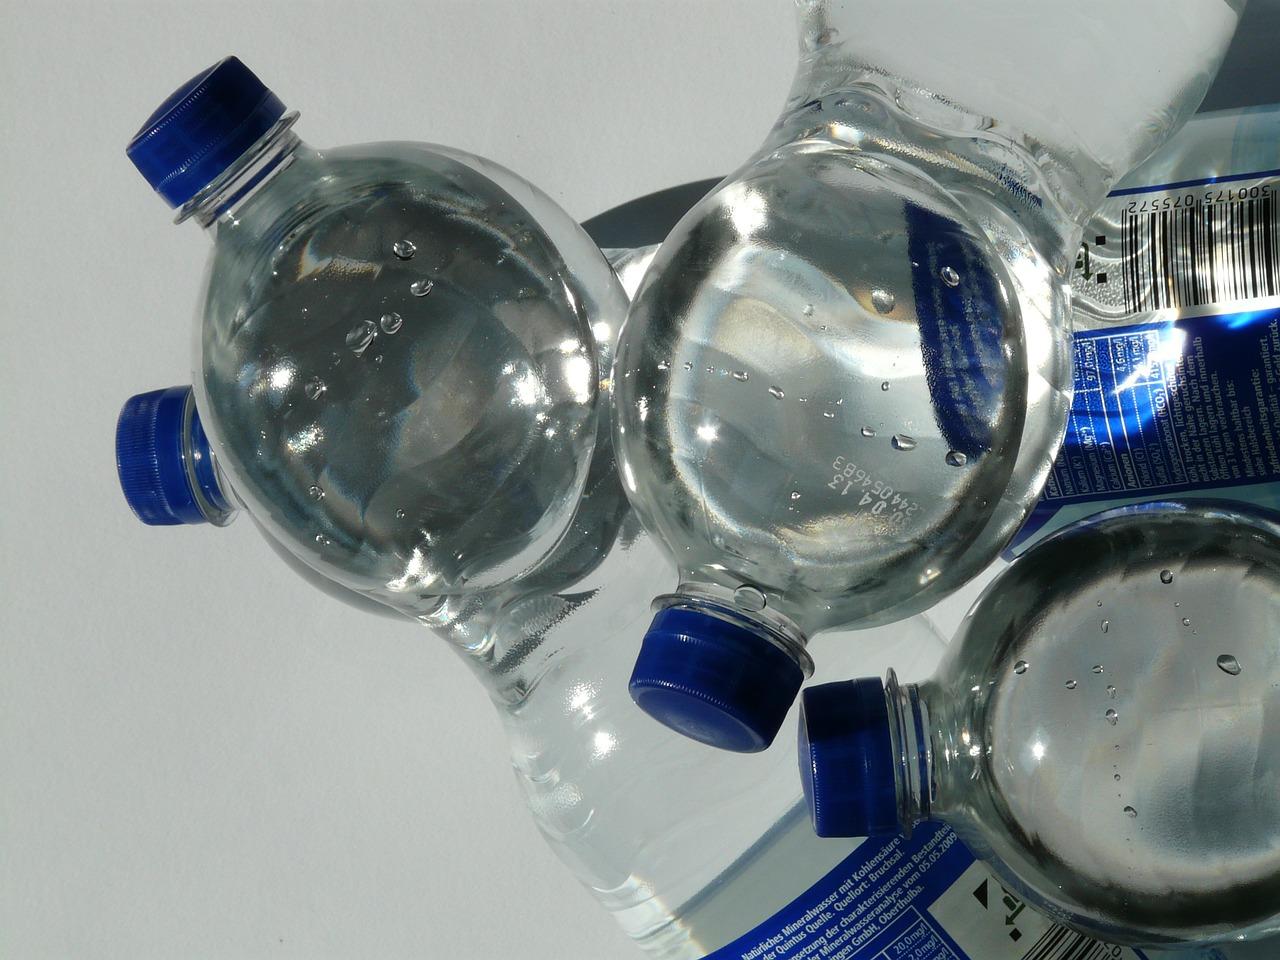 Nestle provided bottled water to Flint, Mich.